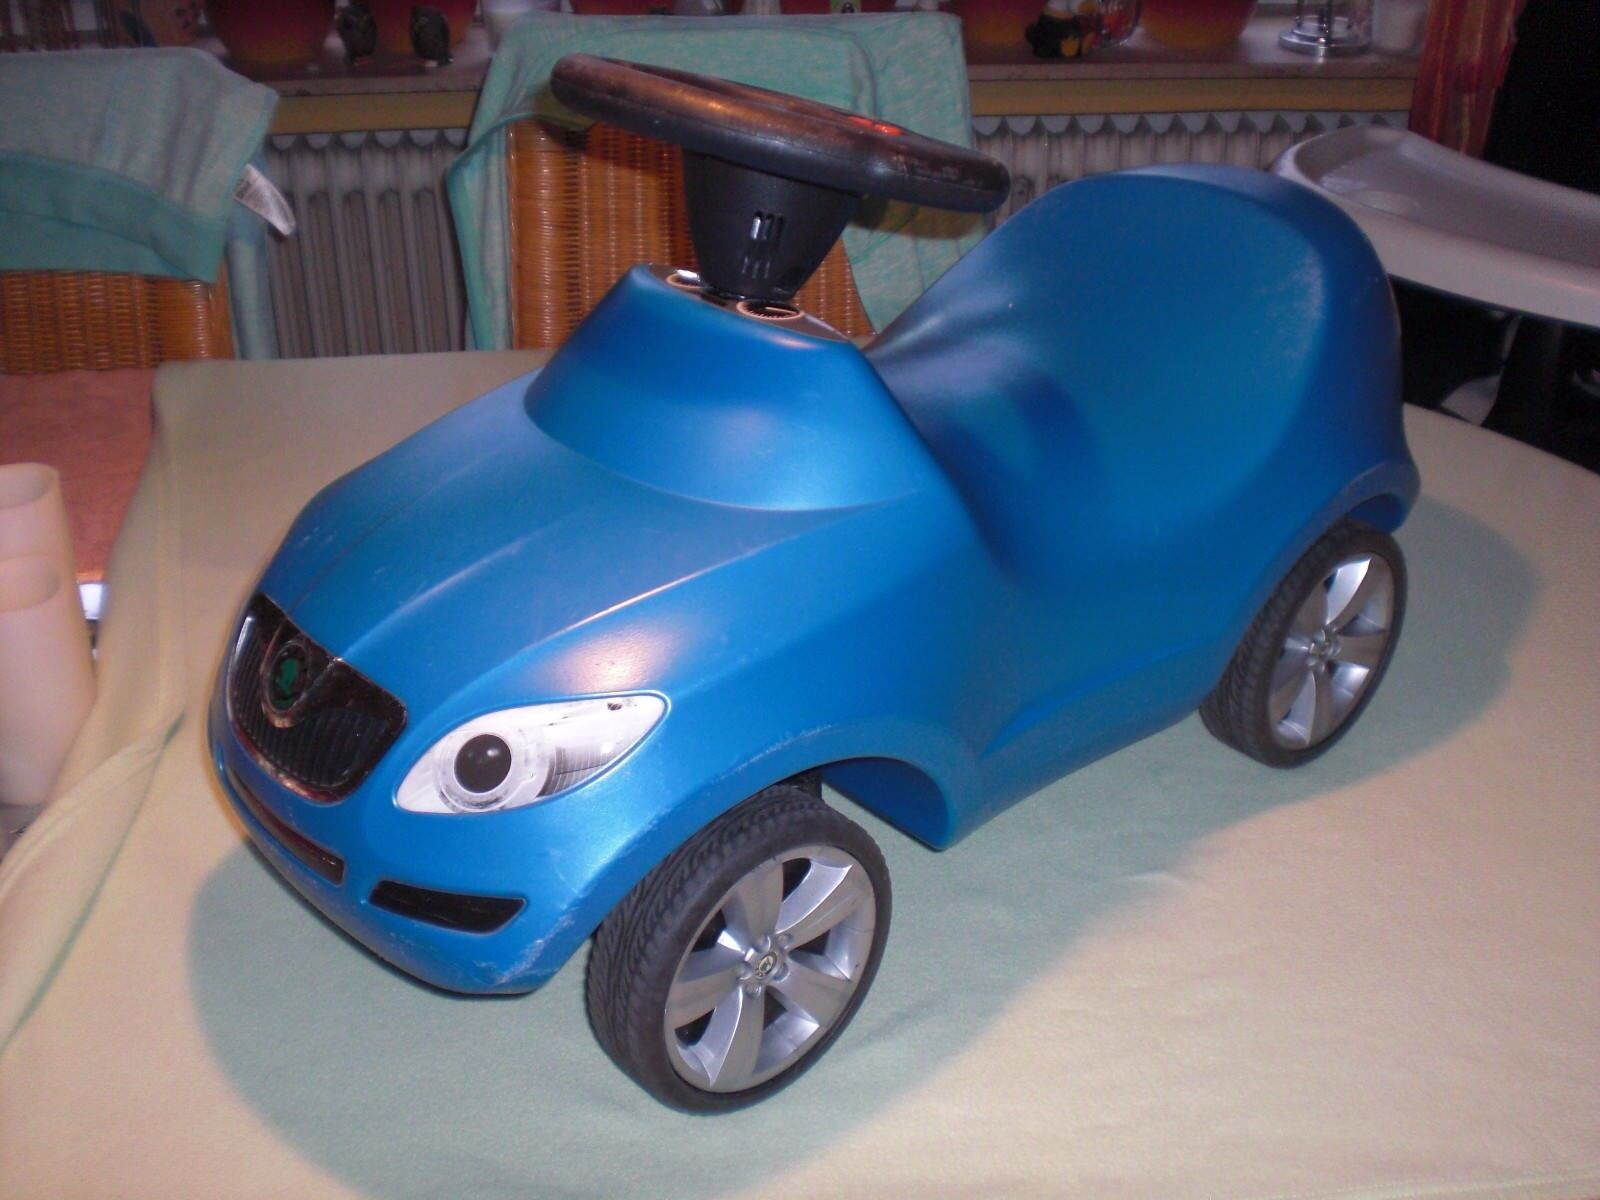 Ferbedo Skoda Roomster Rutscher blau - Flüsterreifen - Rutscherauto Laufauto